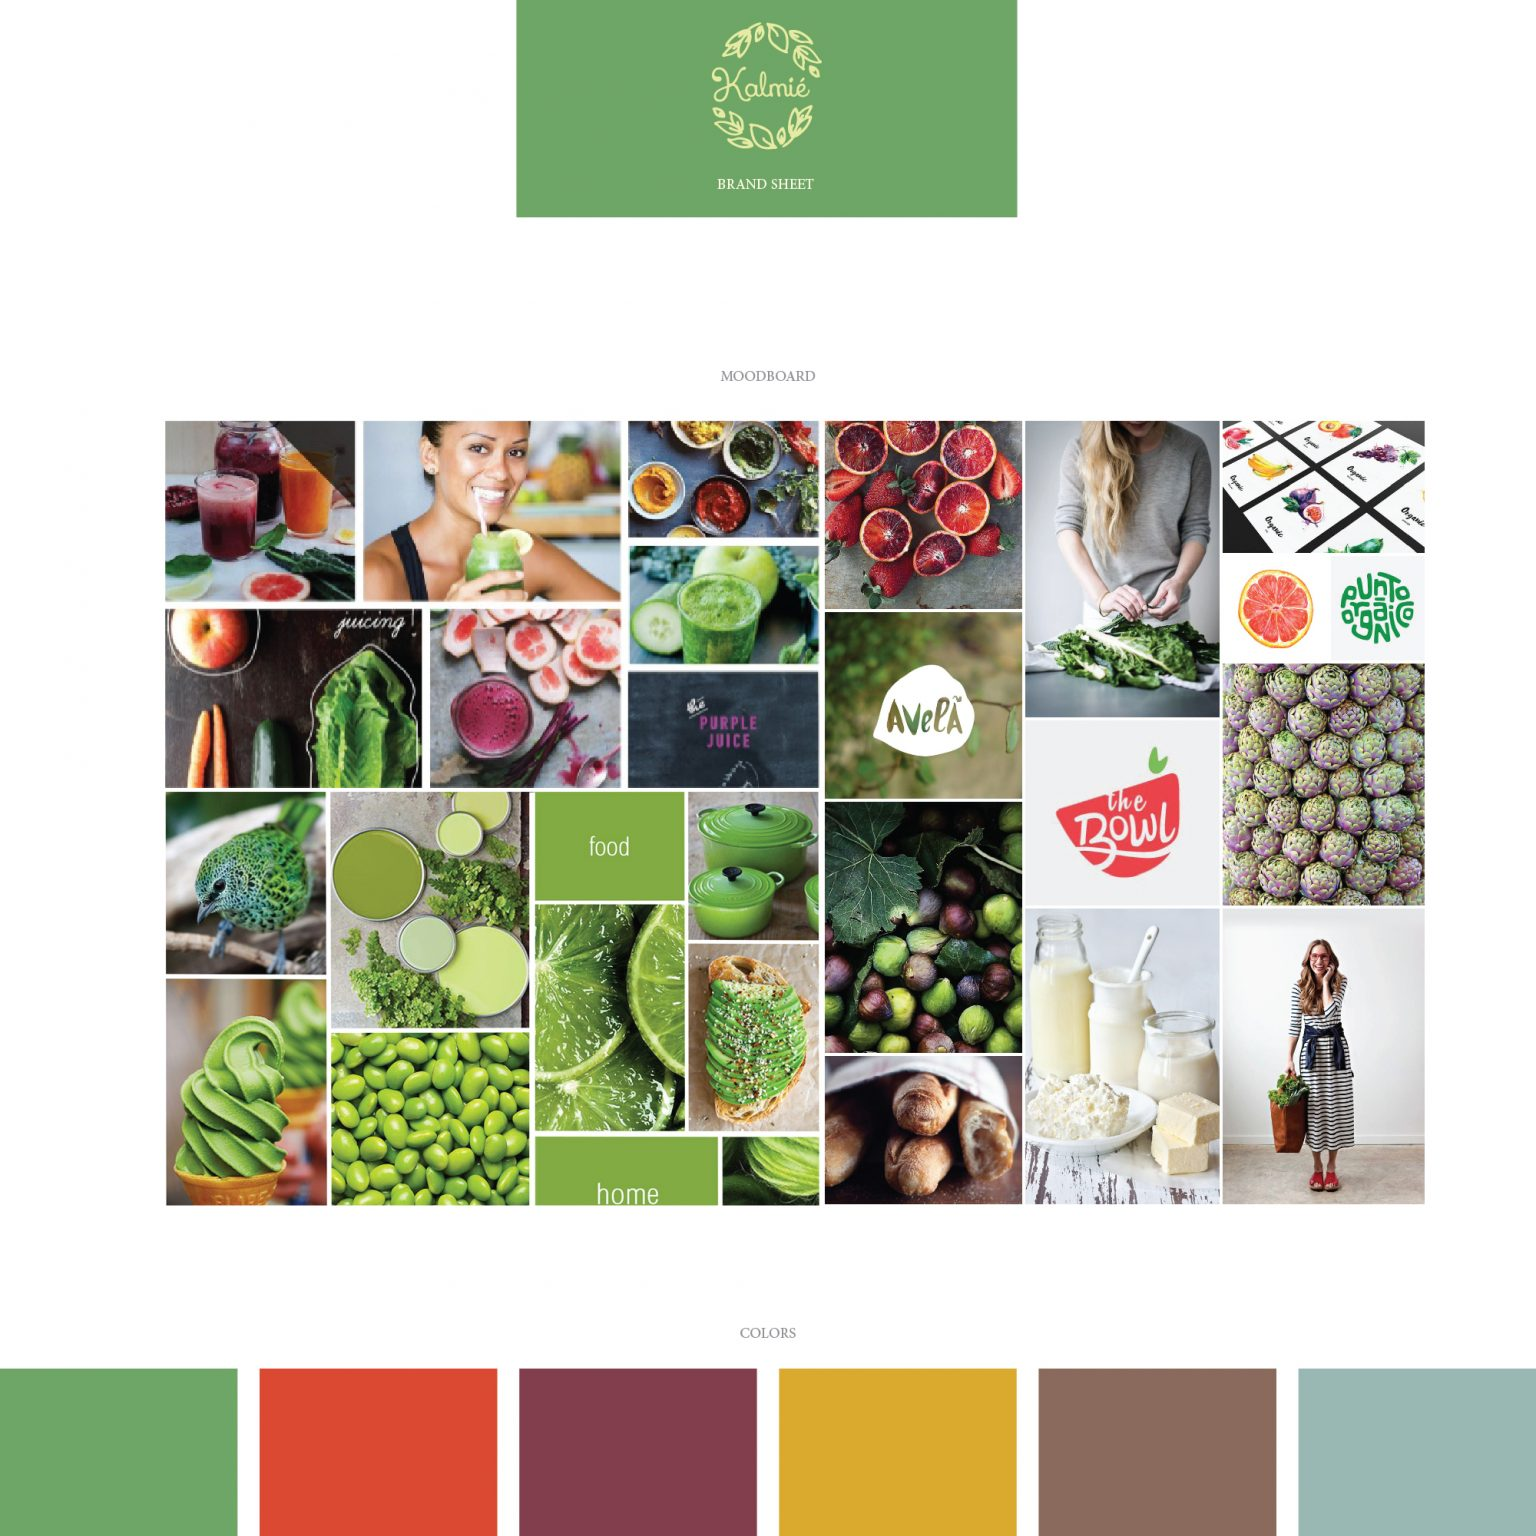 Kalmie productos orgánicos